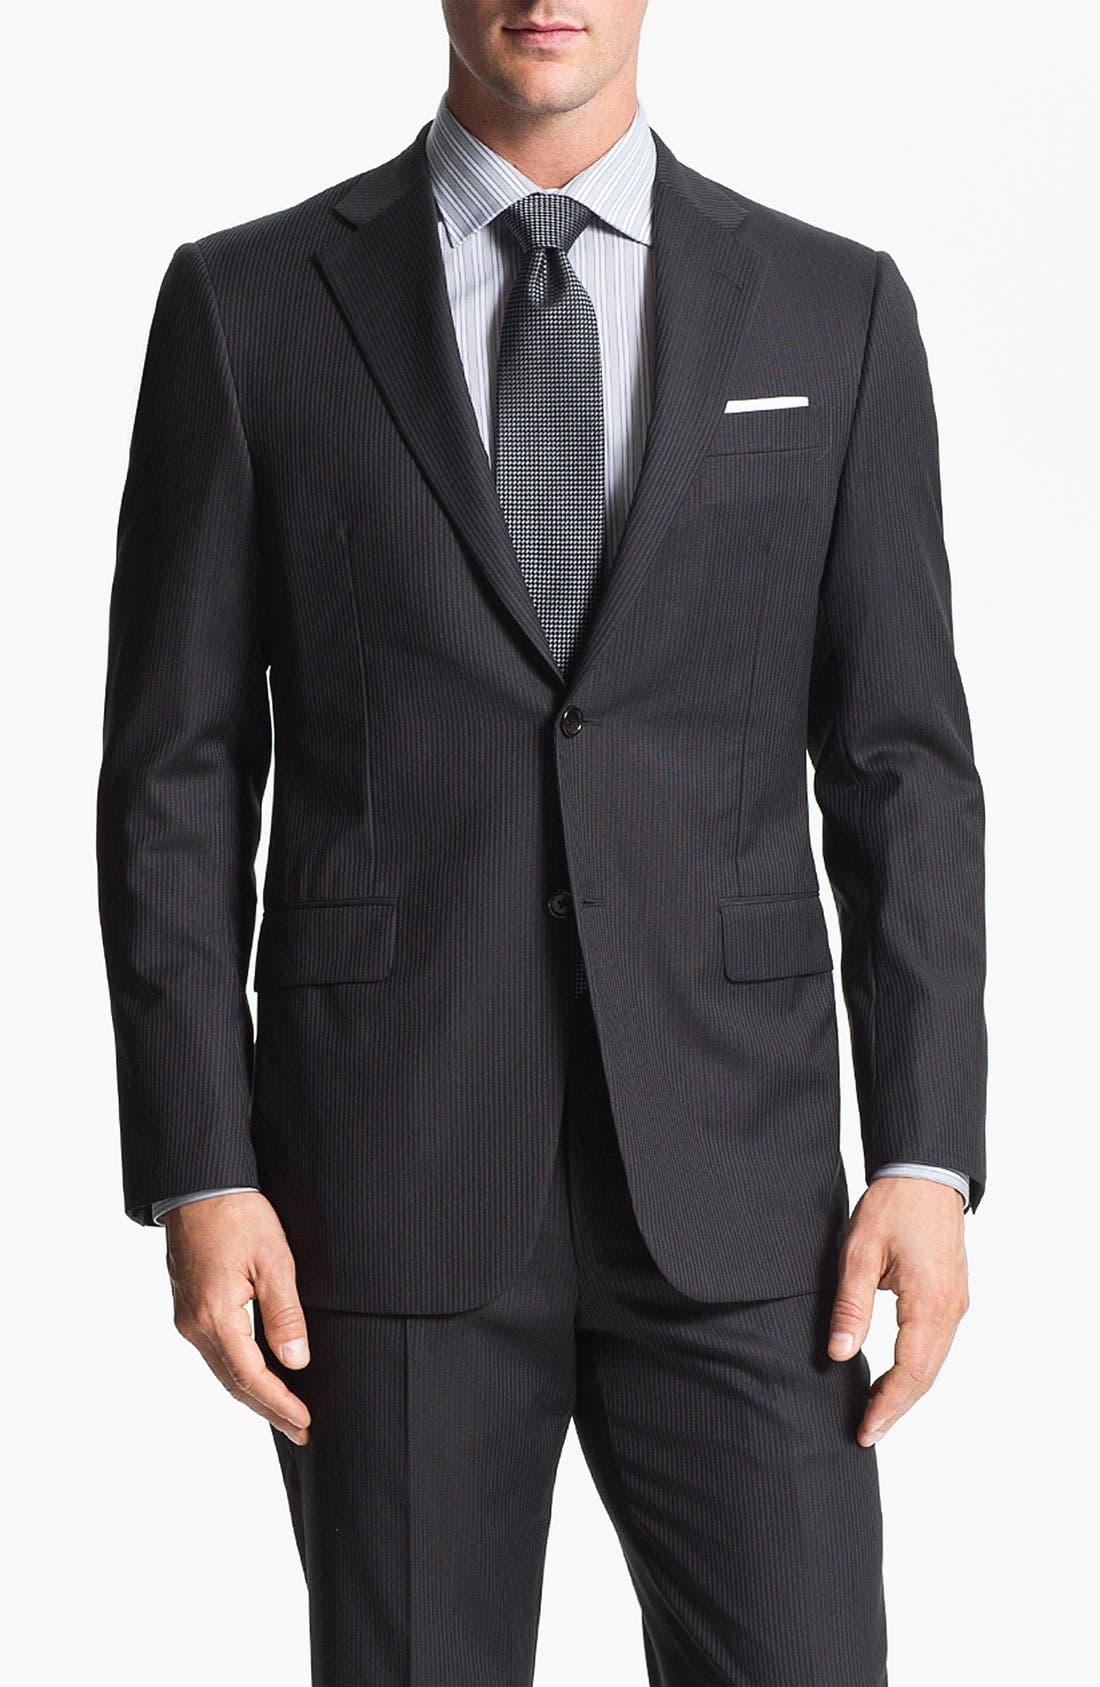 Main Image - Hickey Freeman 'Beacon' Stripe Wool Suit